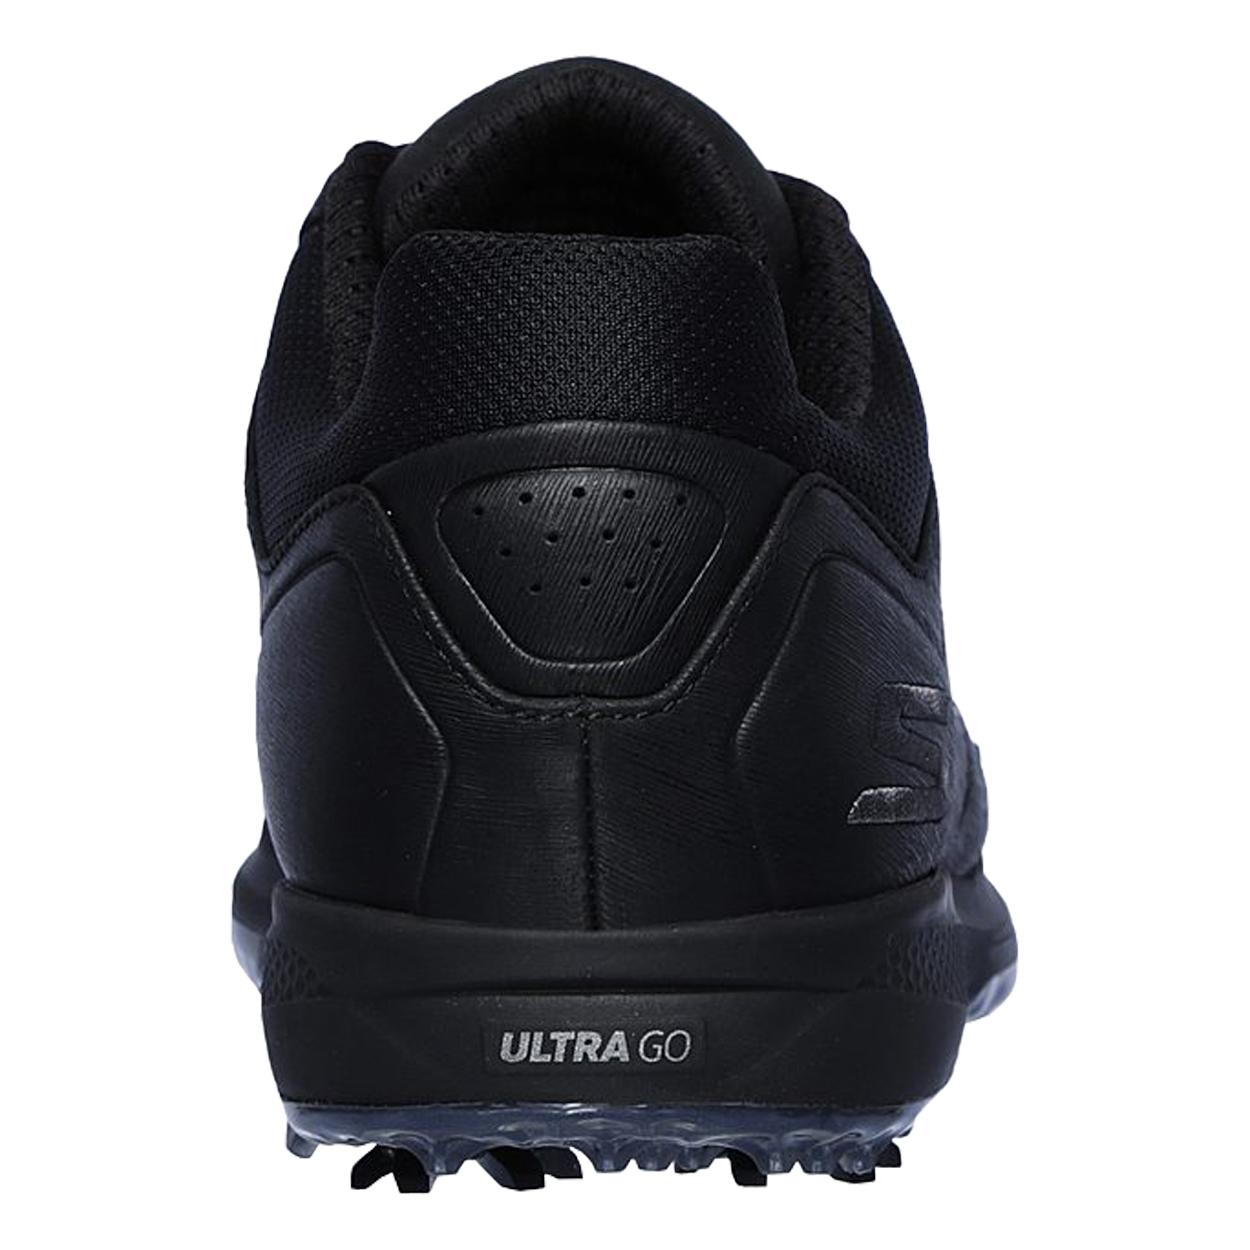 Skechers-Men-039-s-GOgolf-Pro-4-LX-Leather-Golf-Shoe-Brand-New thumbnail 9